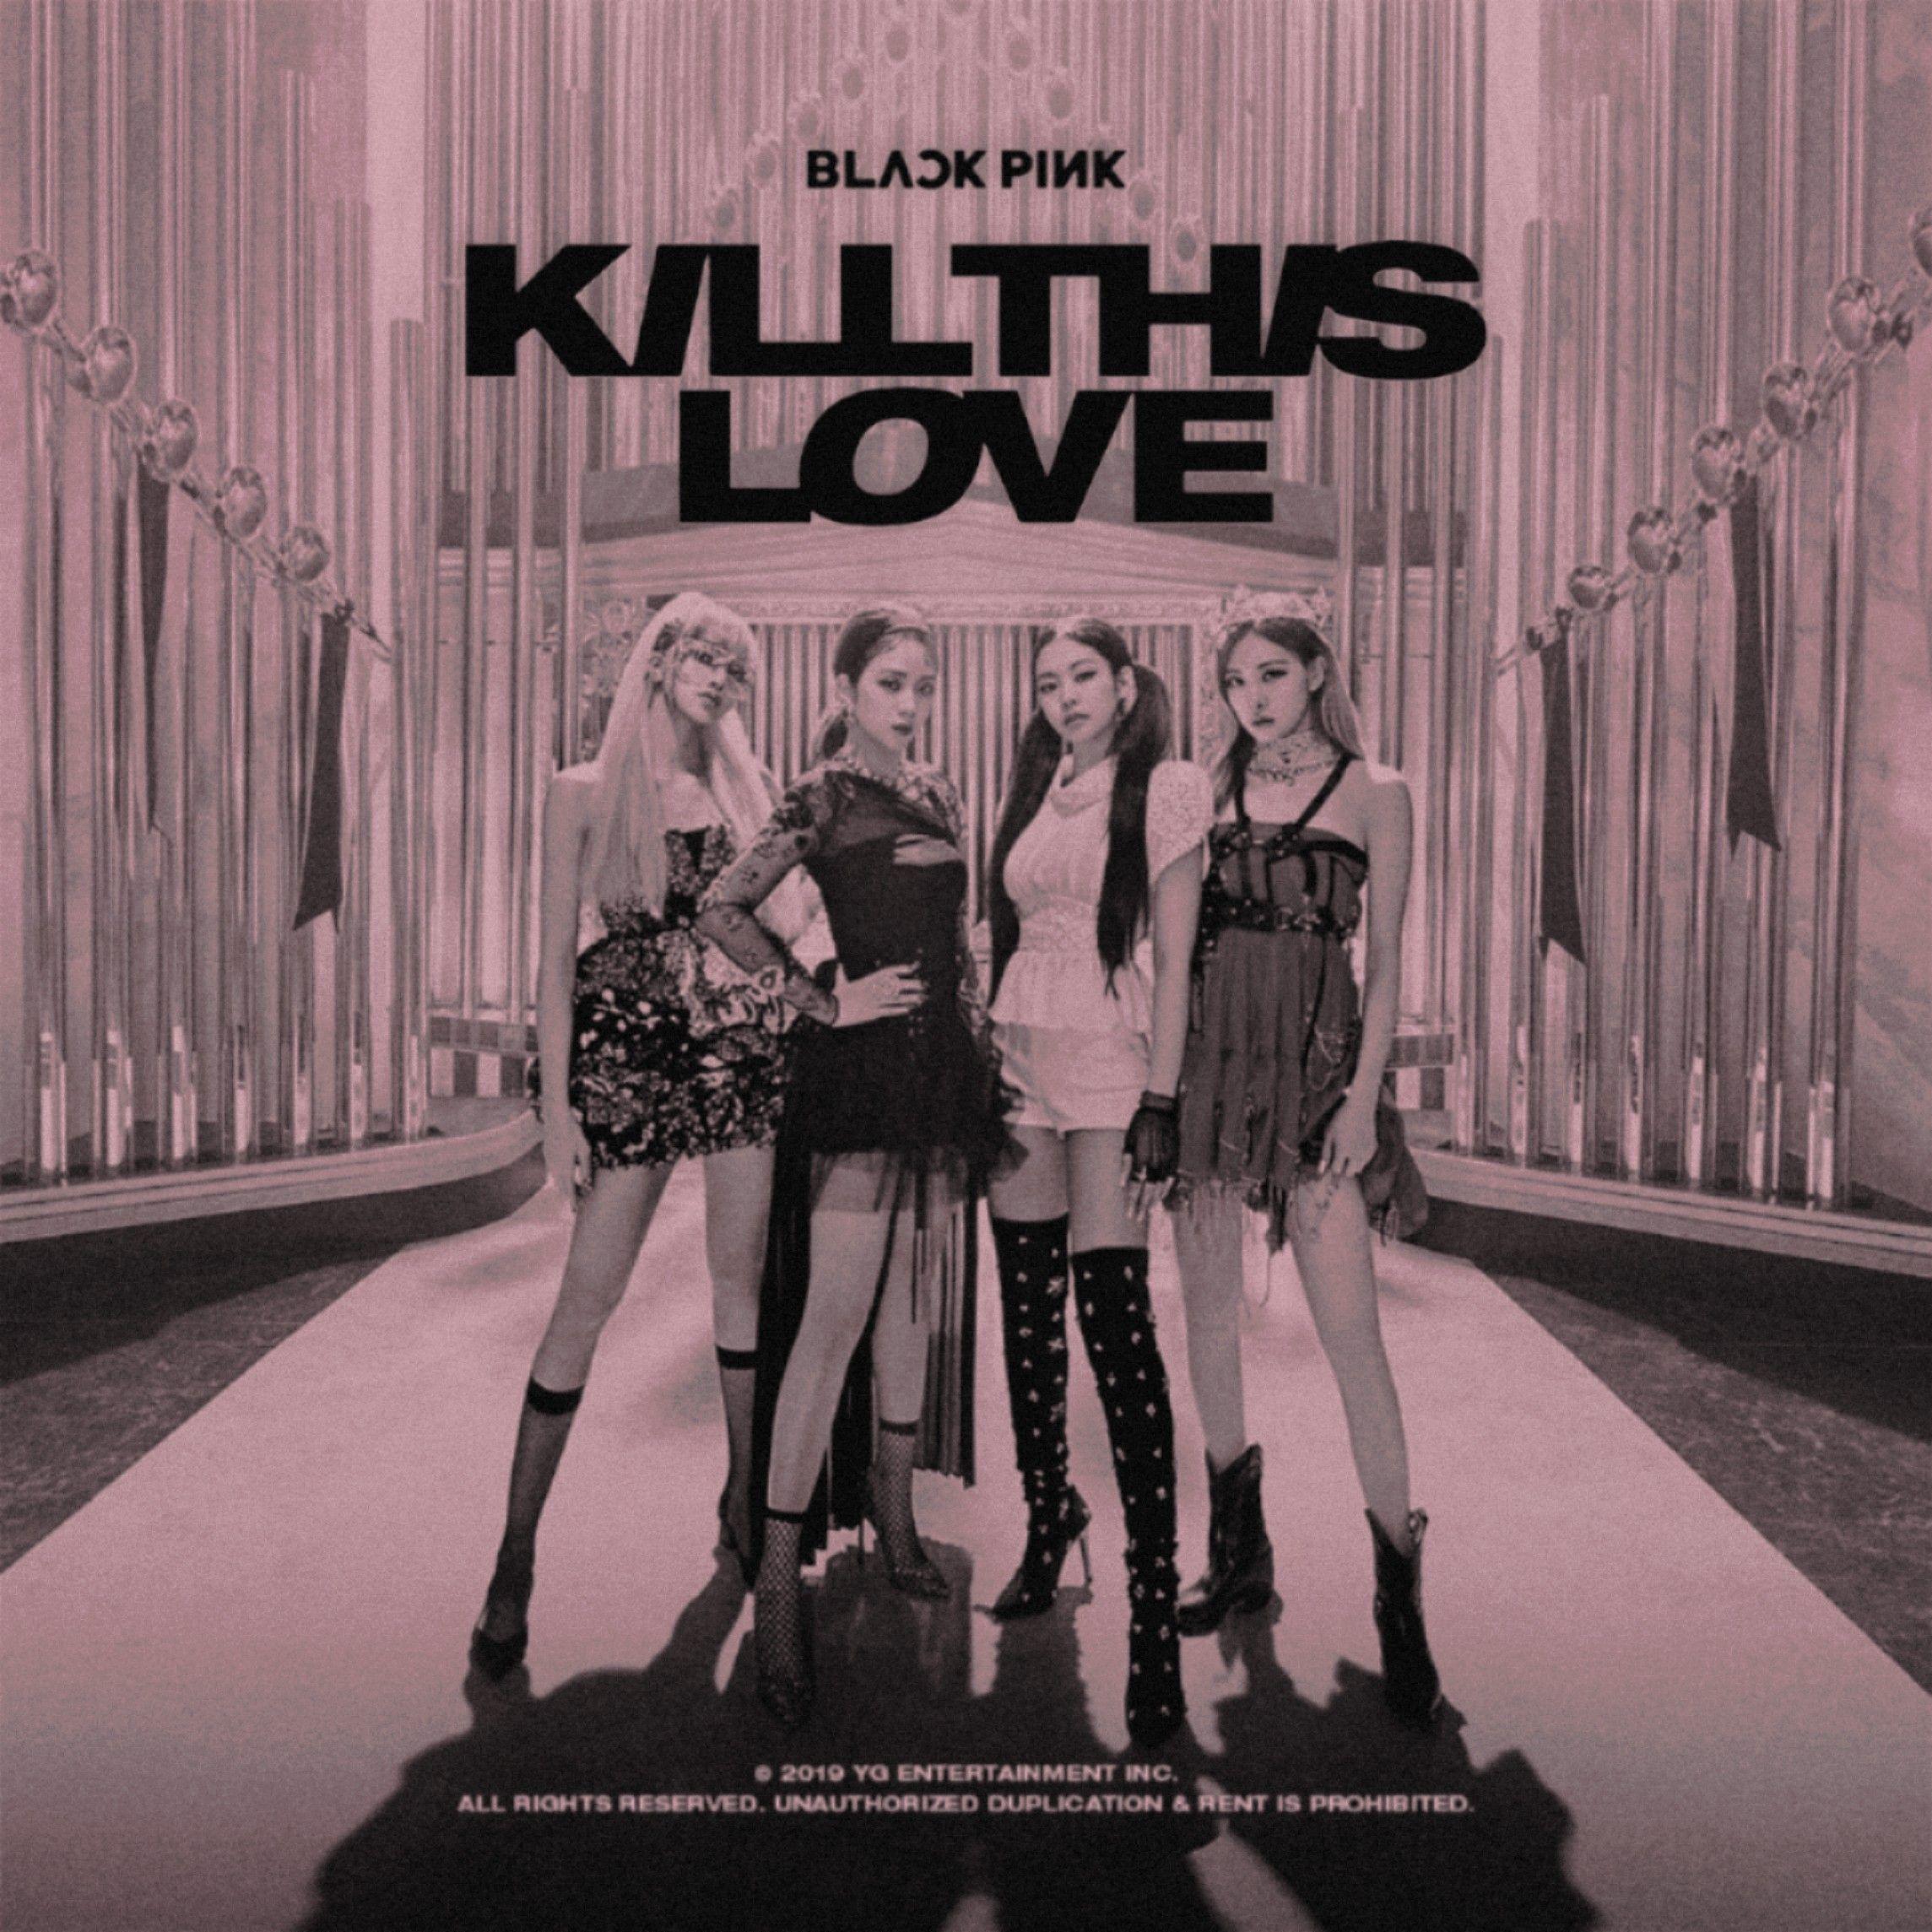 BLACKPINK KILL THIS LOVE album cover by LEAlbum on DeviantArt